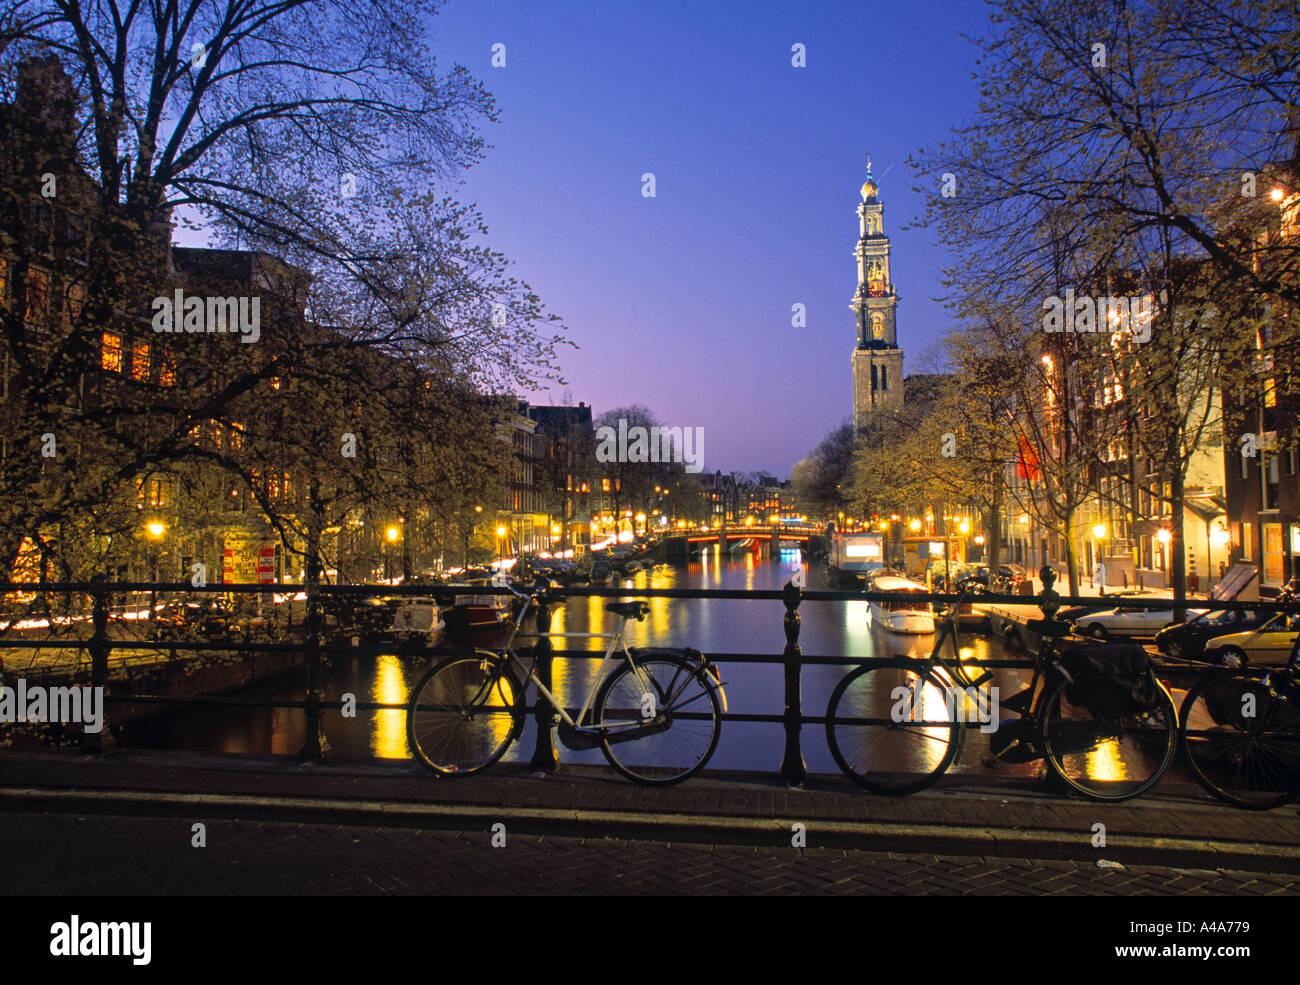 Prinsengracht & Wsterkerk, Amsterdam, Holland - Stock Image